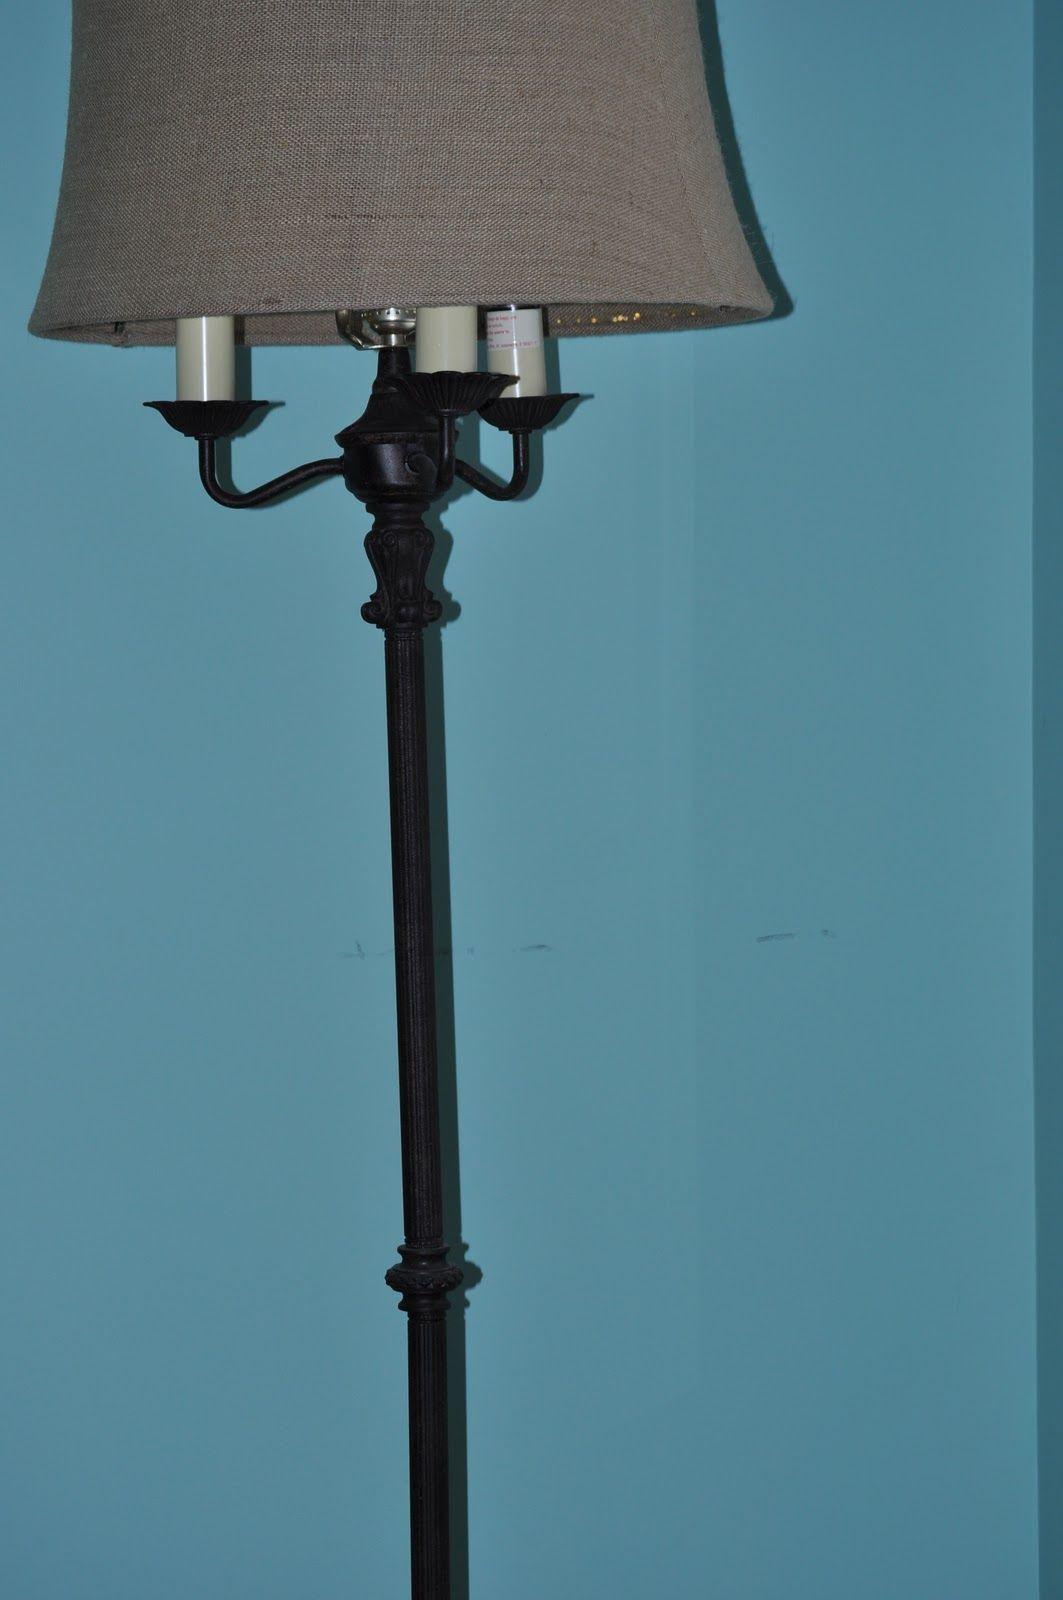 Dale tiffany floor lamps foter - Explore Antique Floor Lamps Floor Lamp Base And More